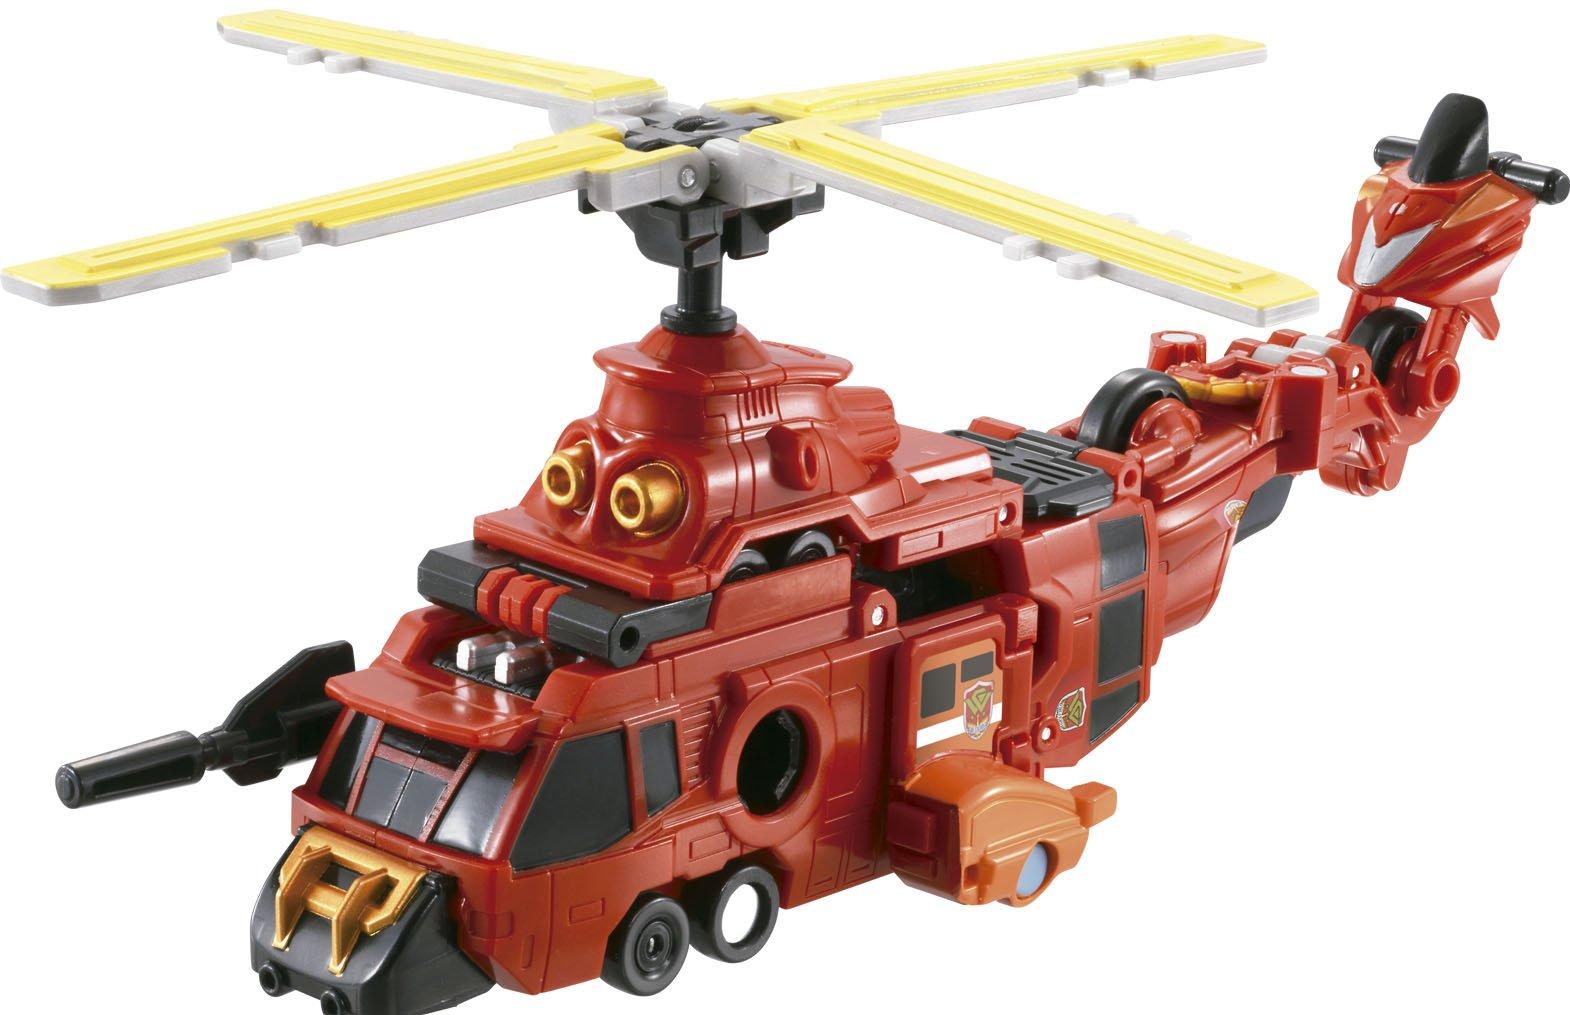 VooV (Boob) rescue united! Gyro Fire